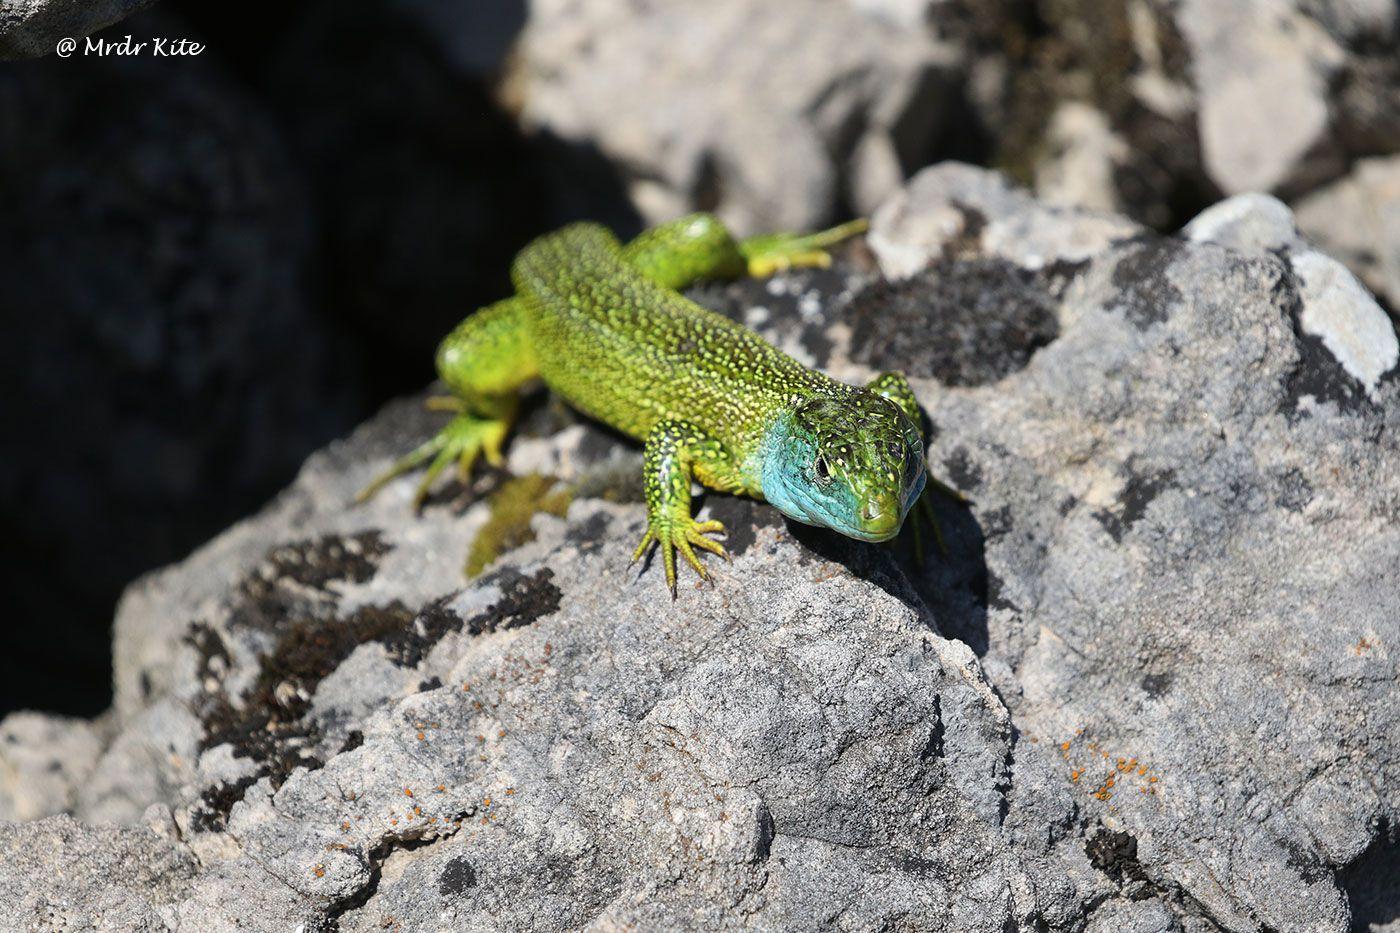 Lézard des murailles et lézard vert mâle